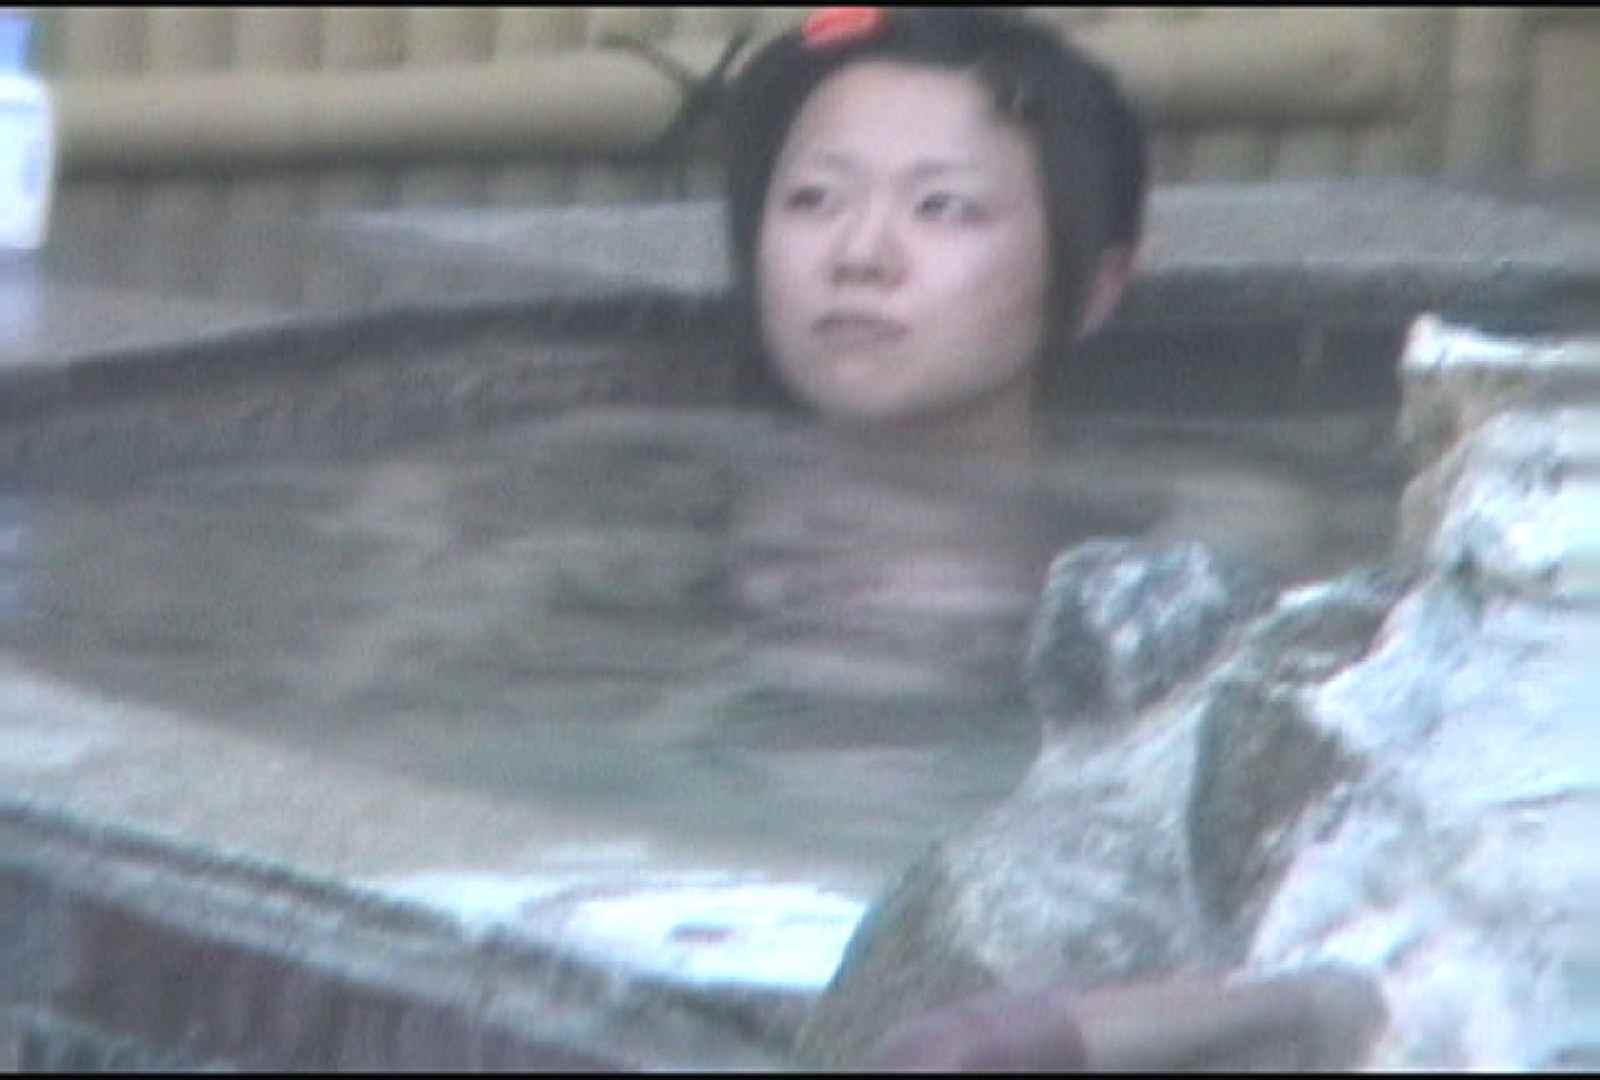 Aquaな露天風呂Vol.175 盗撮シリーズ | 露天風呂編  91PIX 73